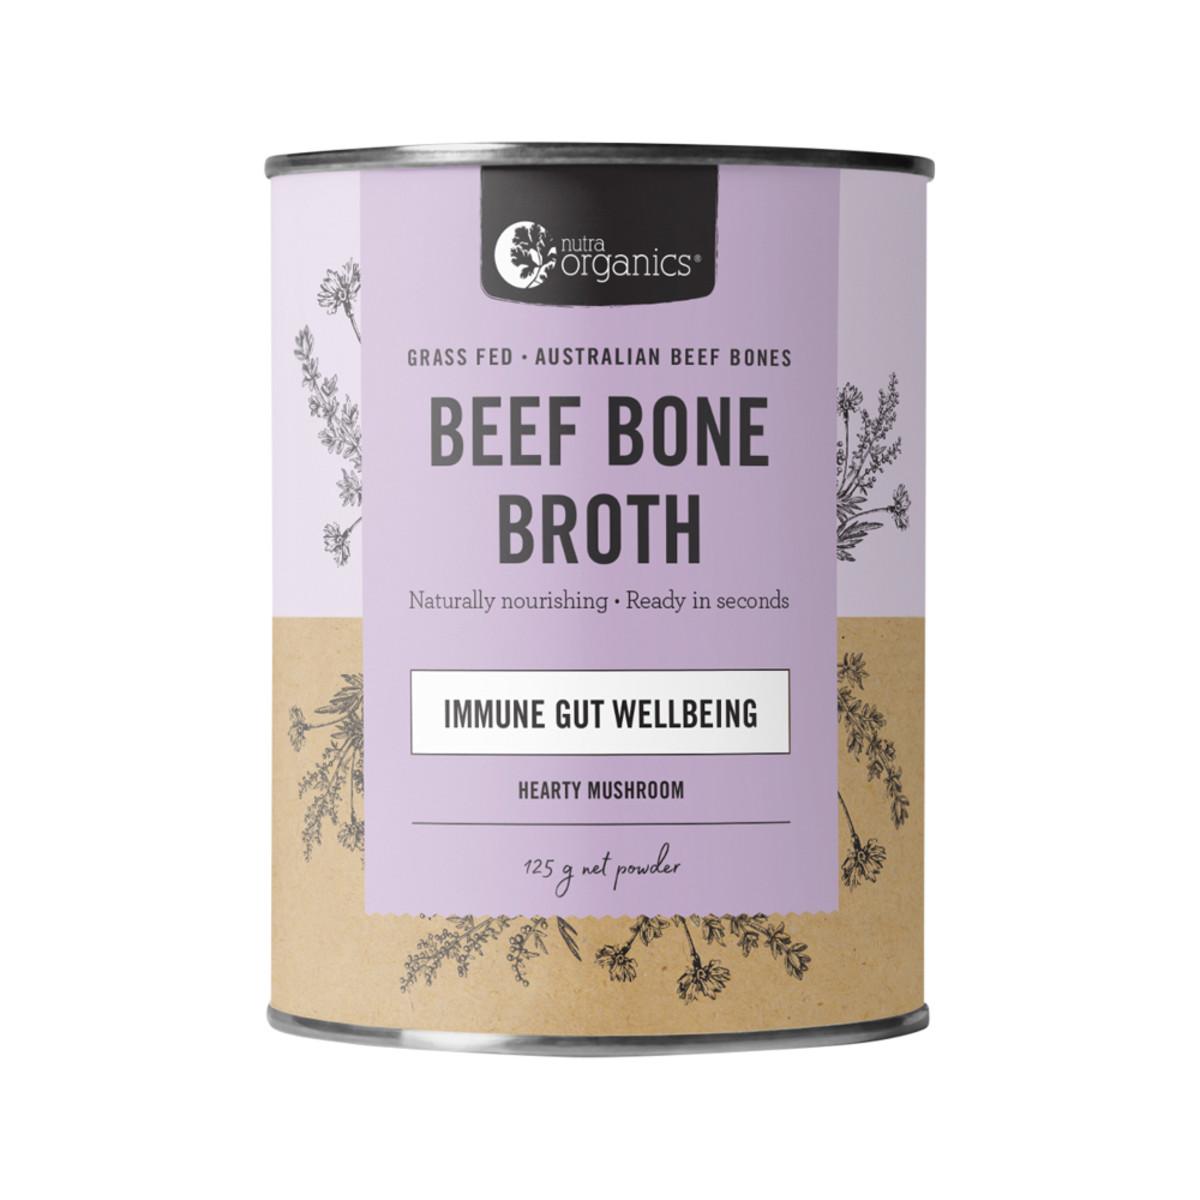 Nutra Organics Beef Bone Broth - Adaptogenic Mushroom